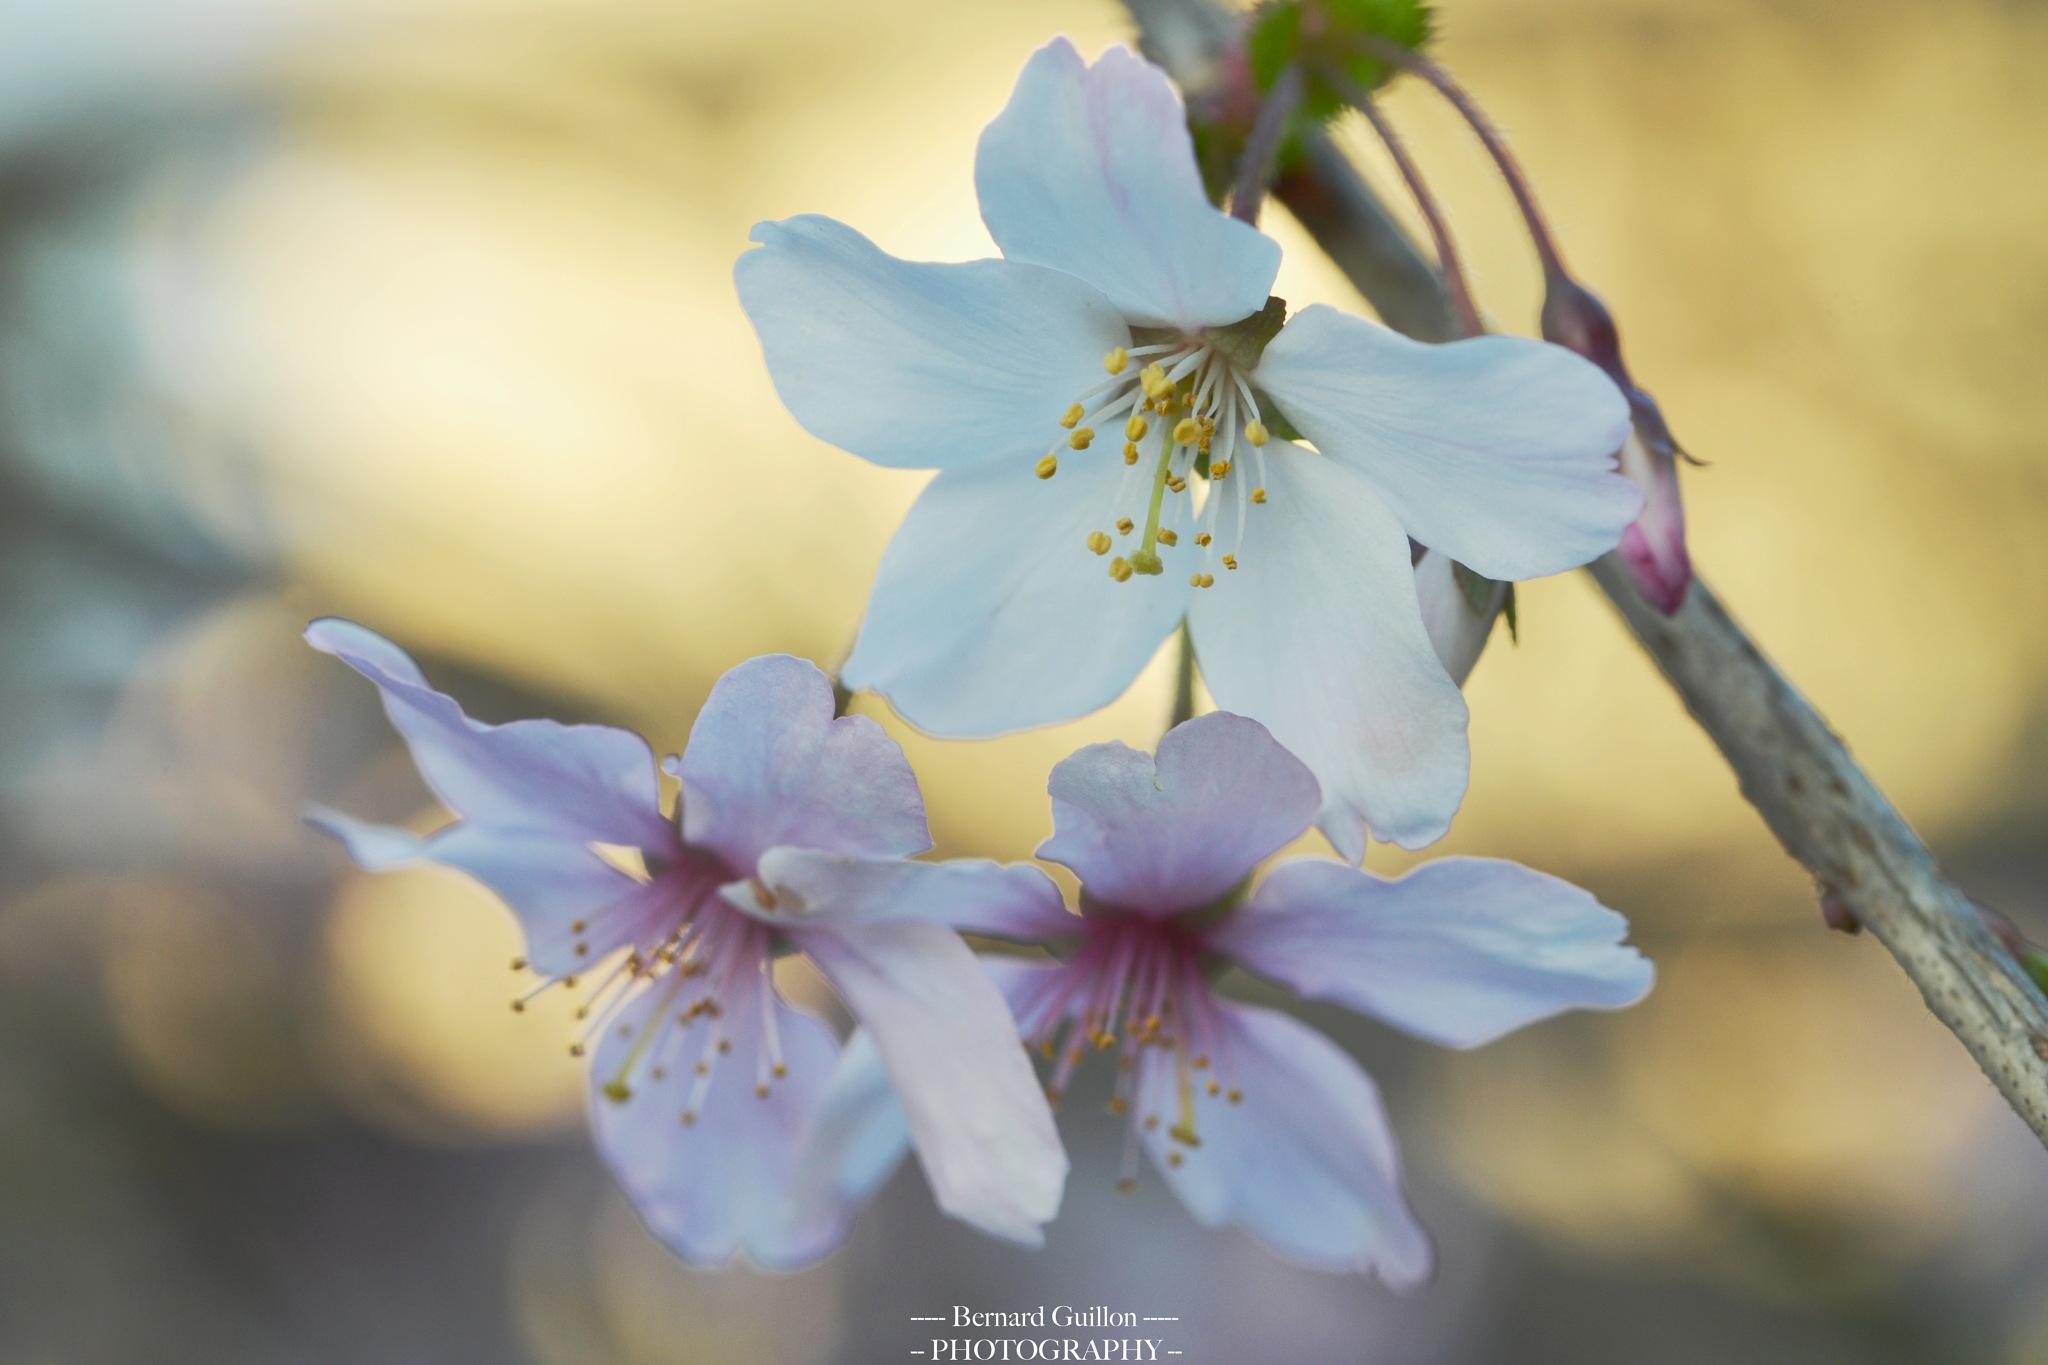 Soft beauty of spring by Bernard Guillon